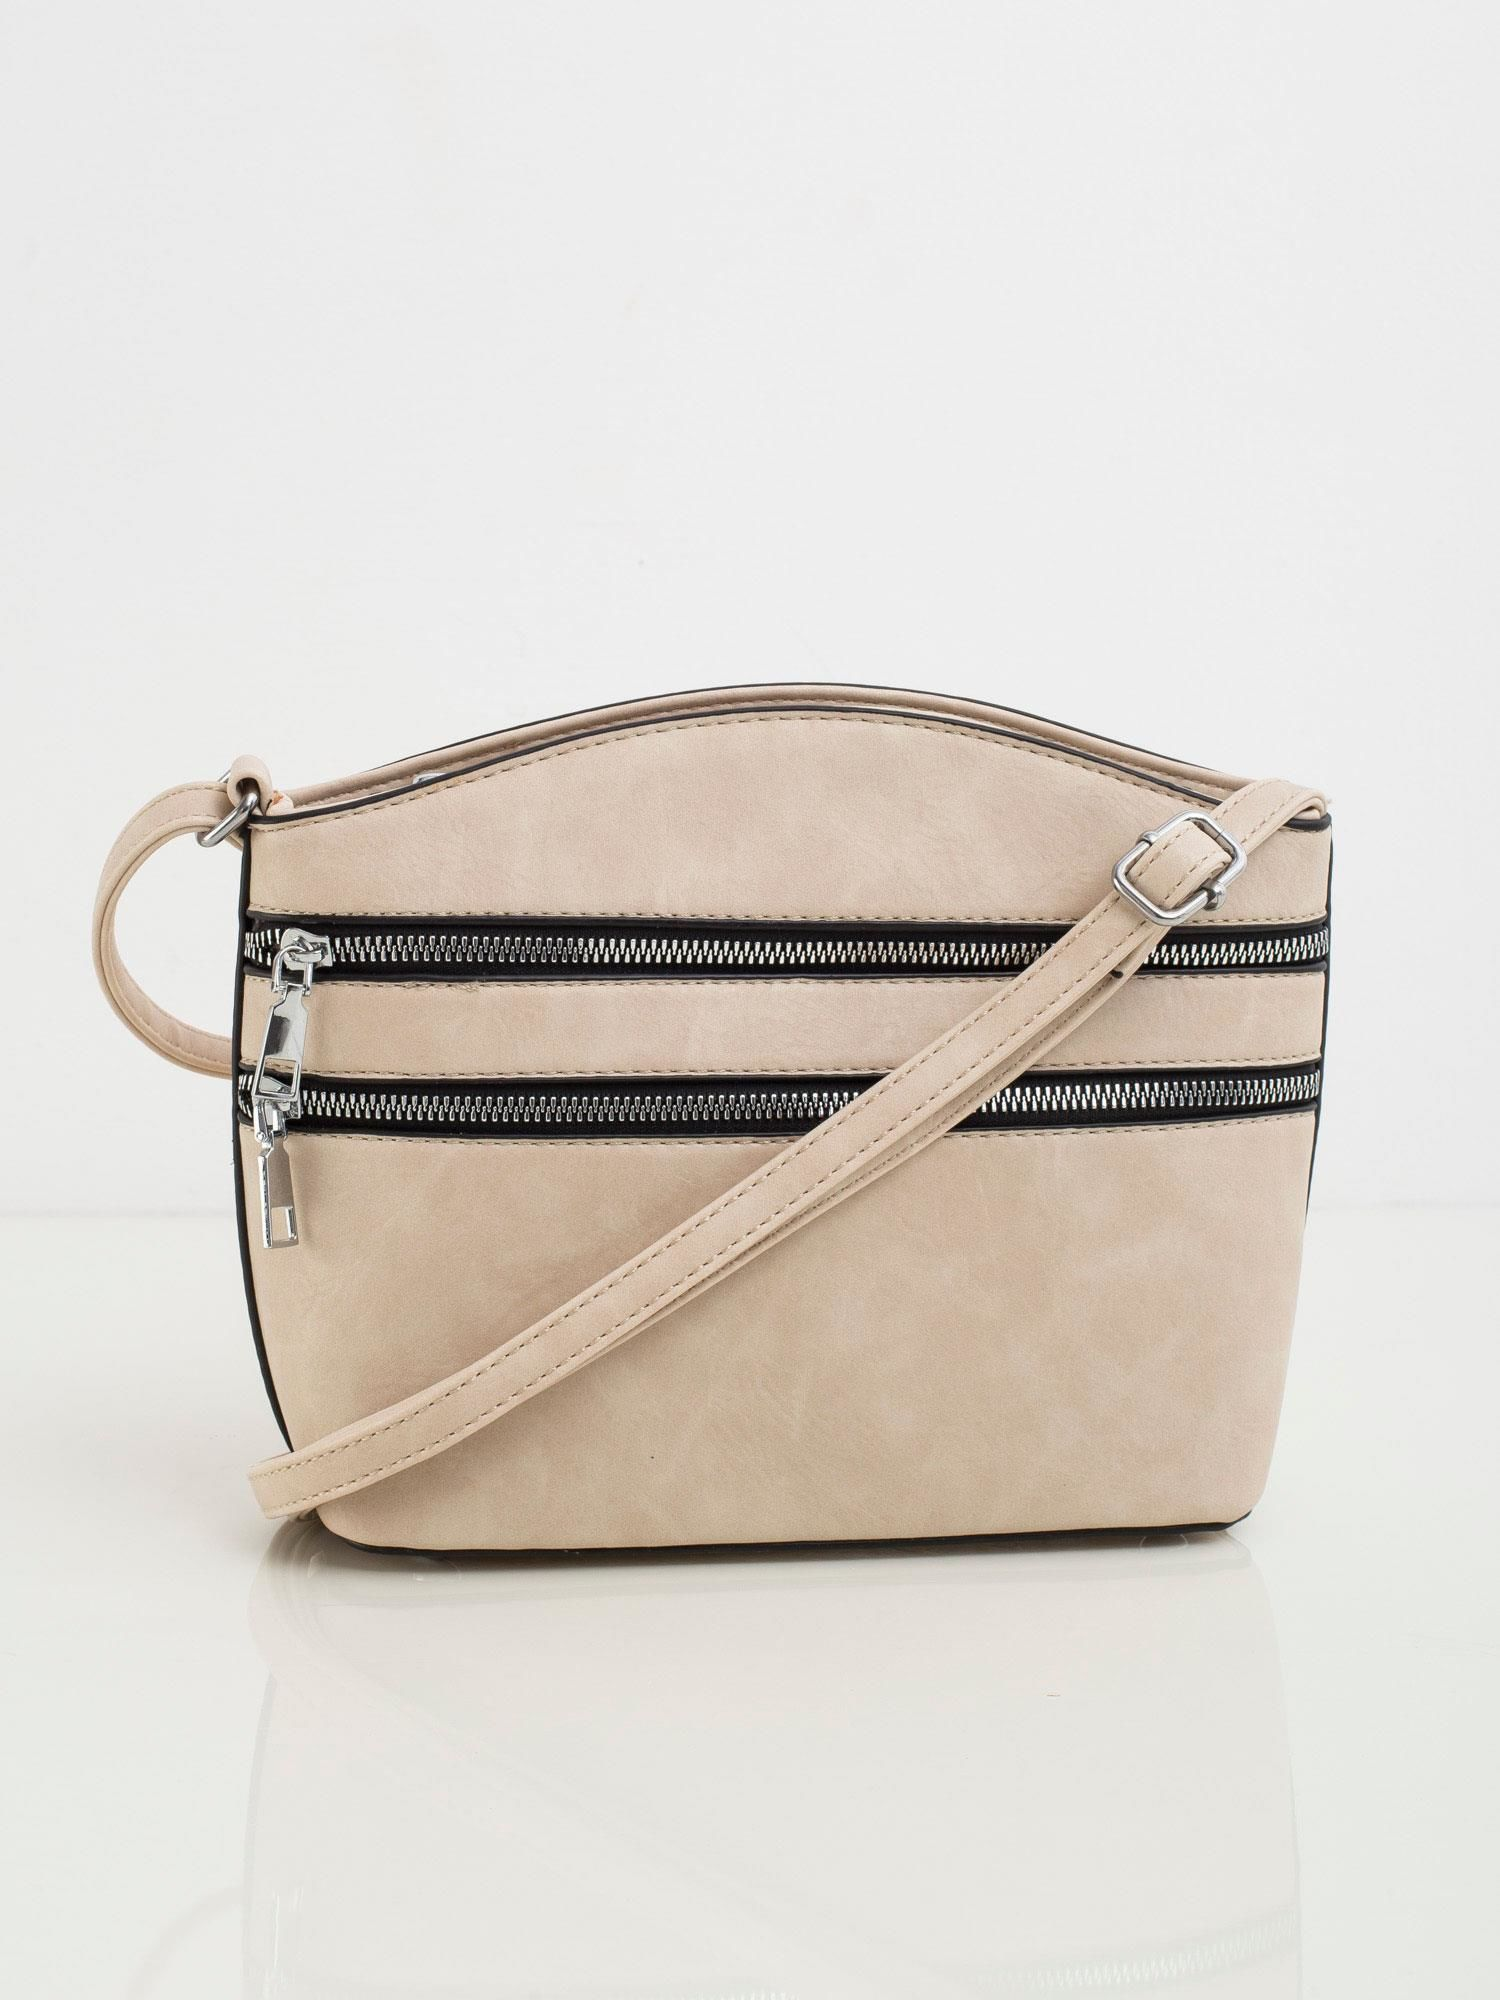 Béžová kabelka na rameno so zipsami - UNI